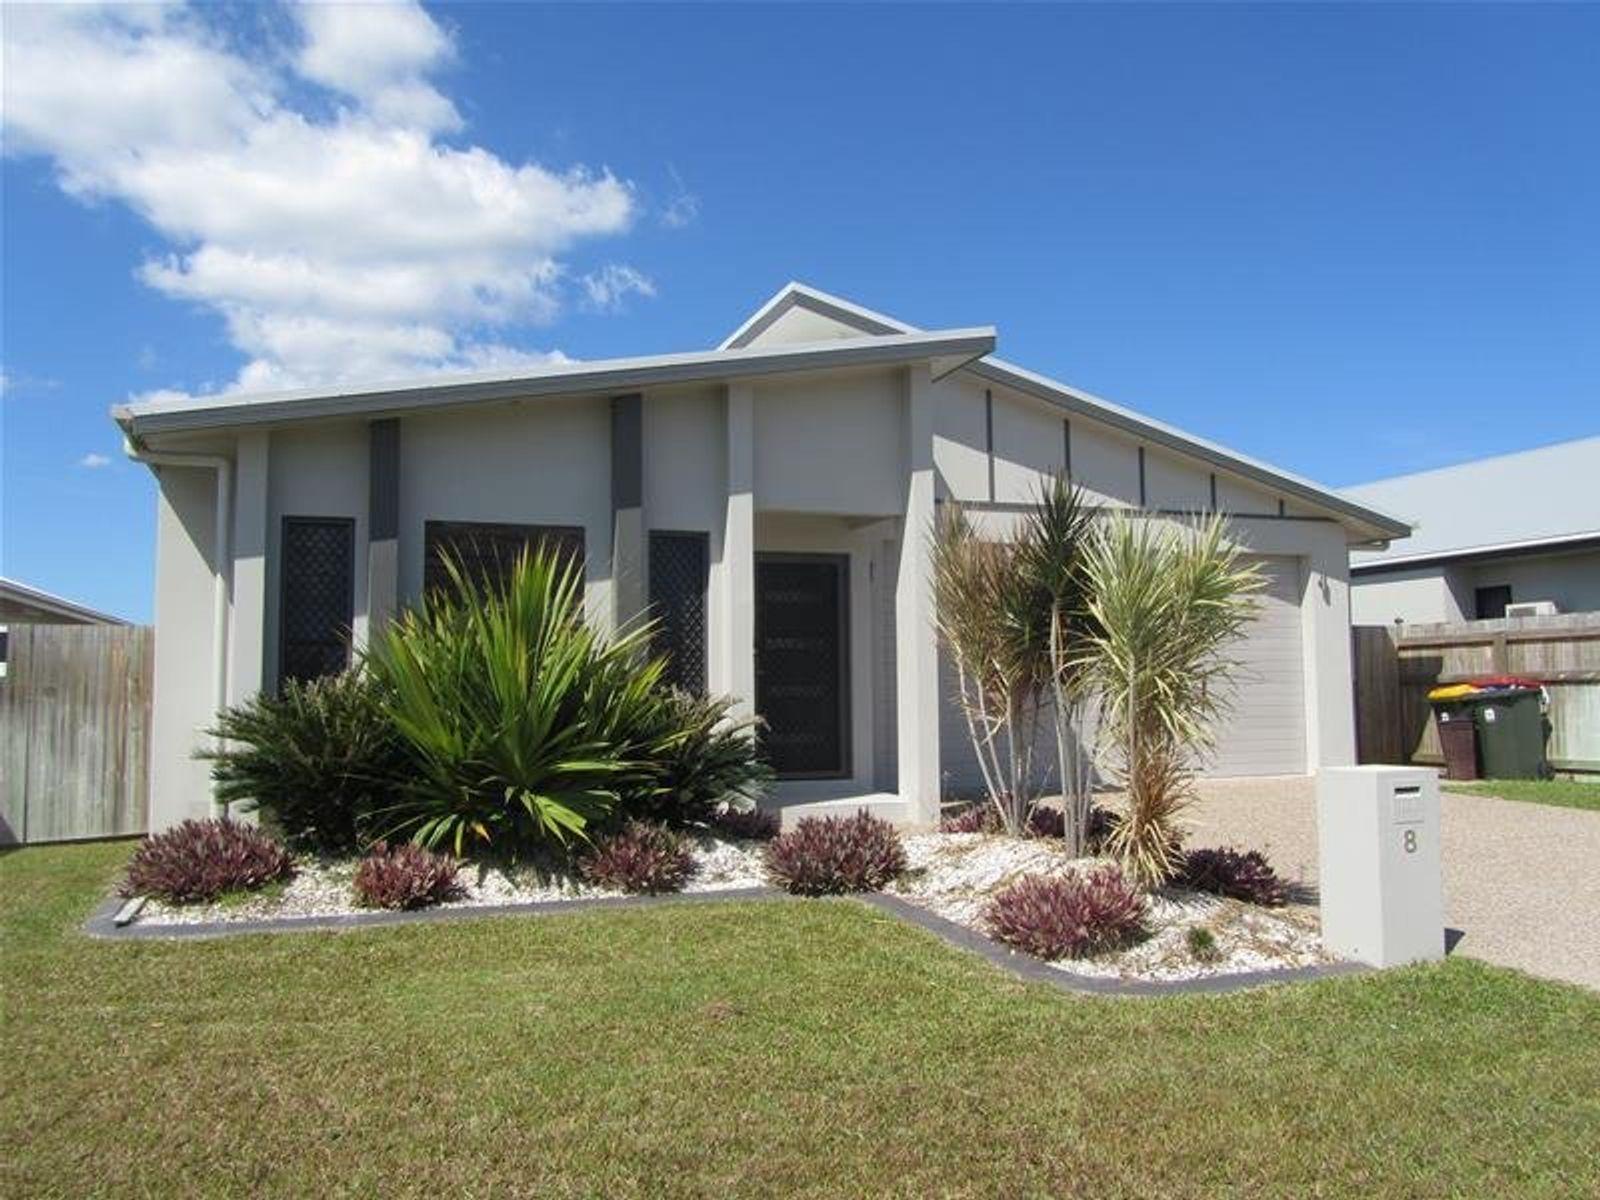 8 Milkwood Crescent, Bohle Plains, QLD 4817